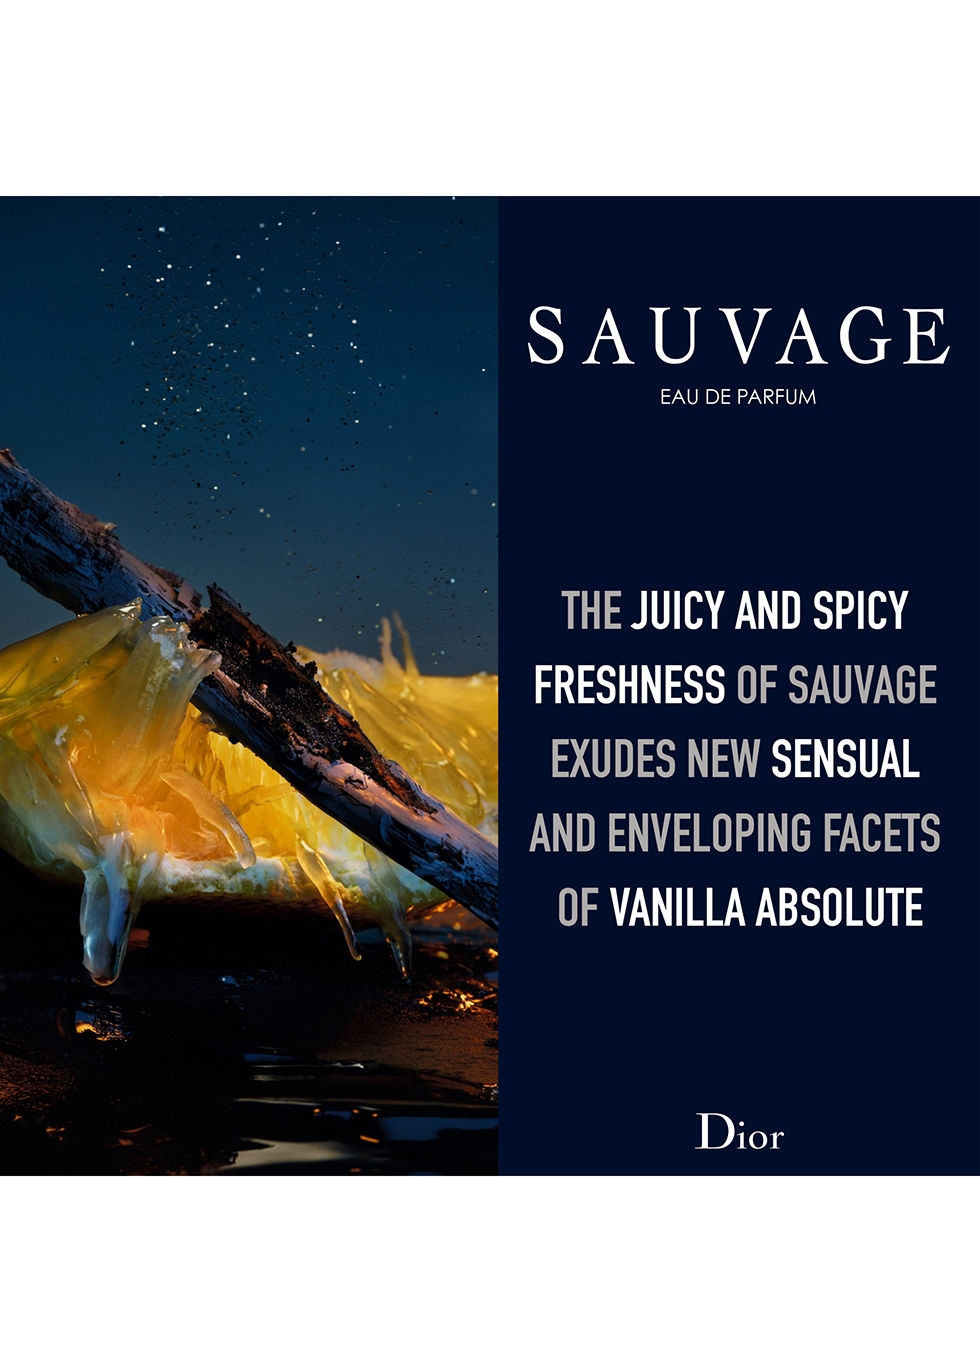 Sauvage Eau de Parfum 100ml - Dior